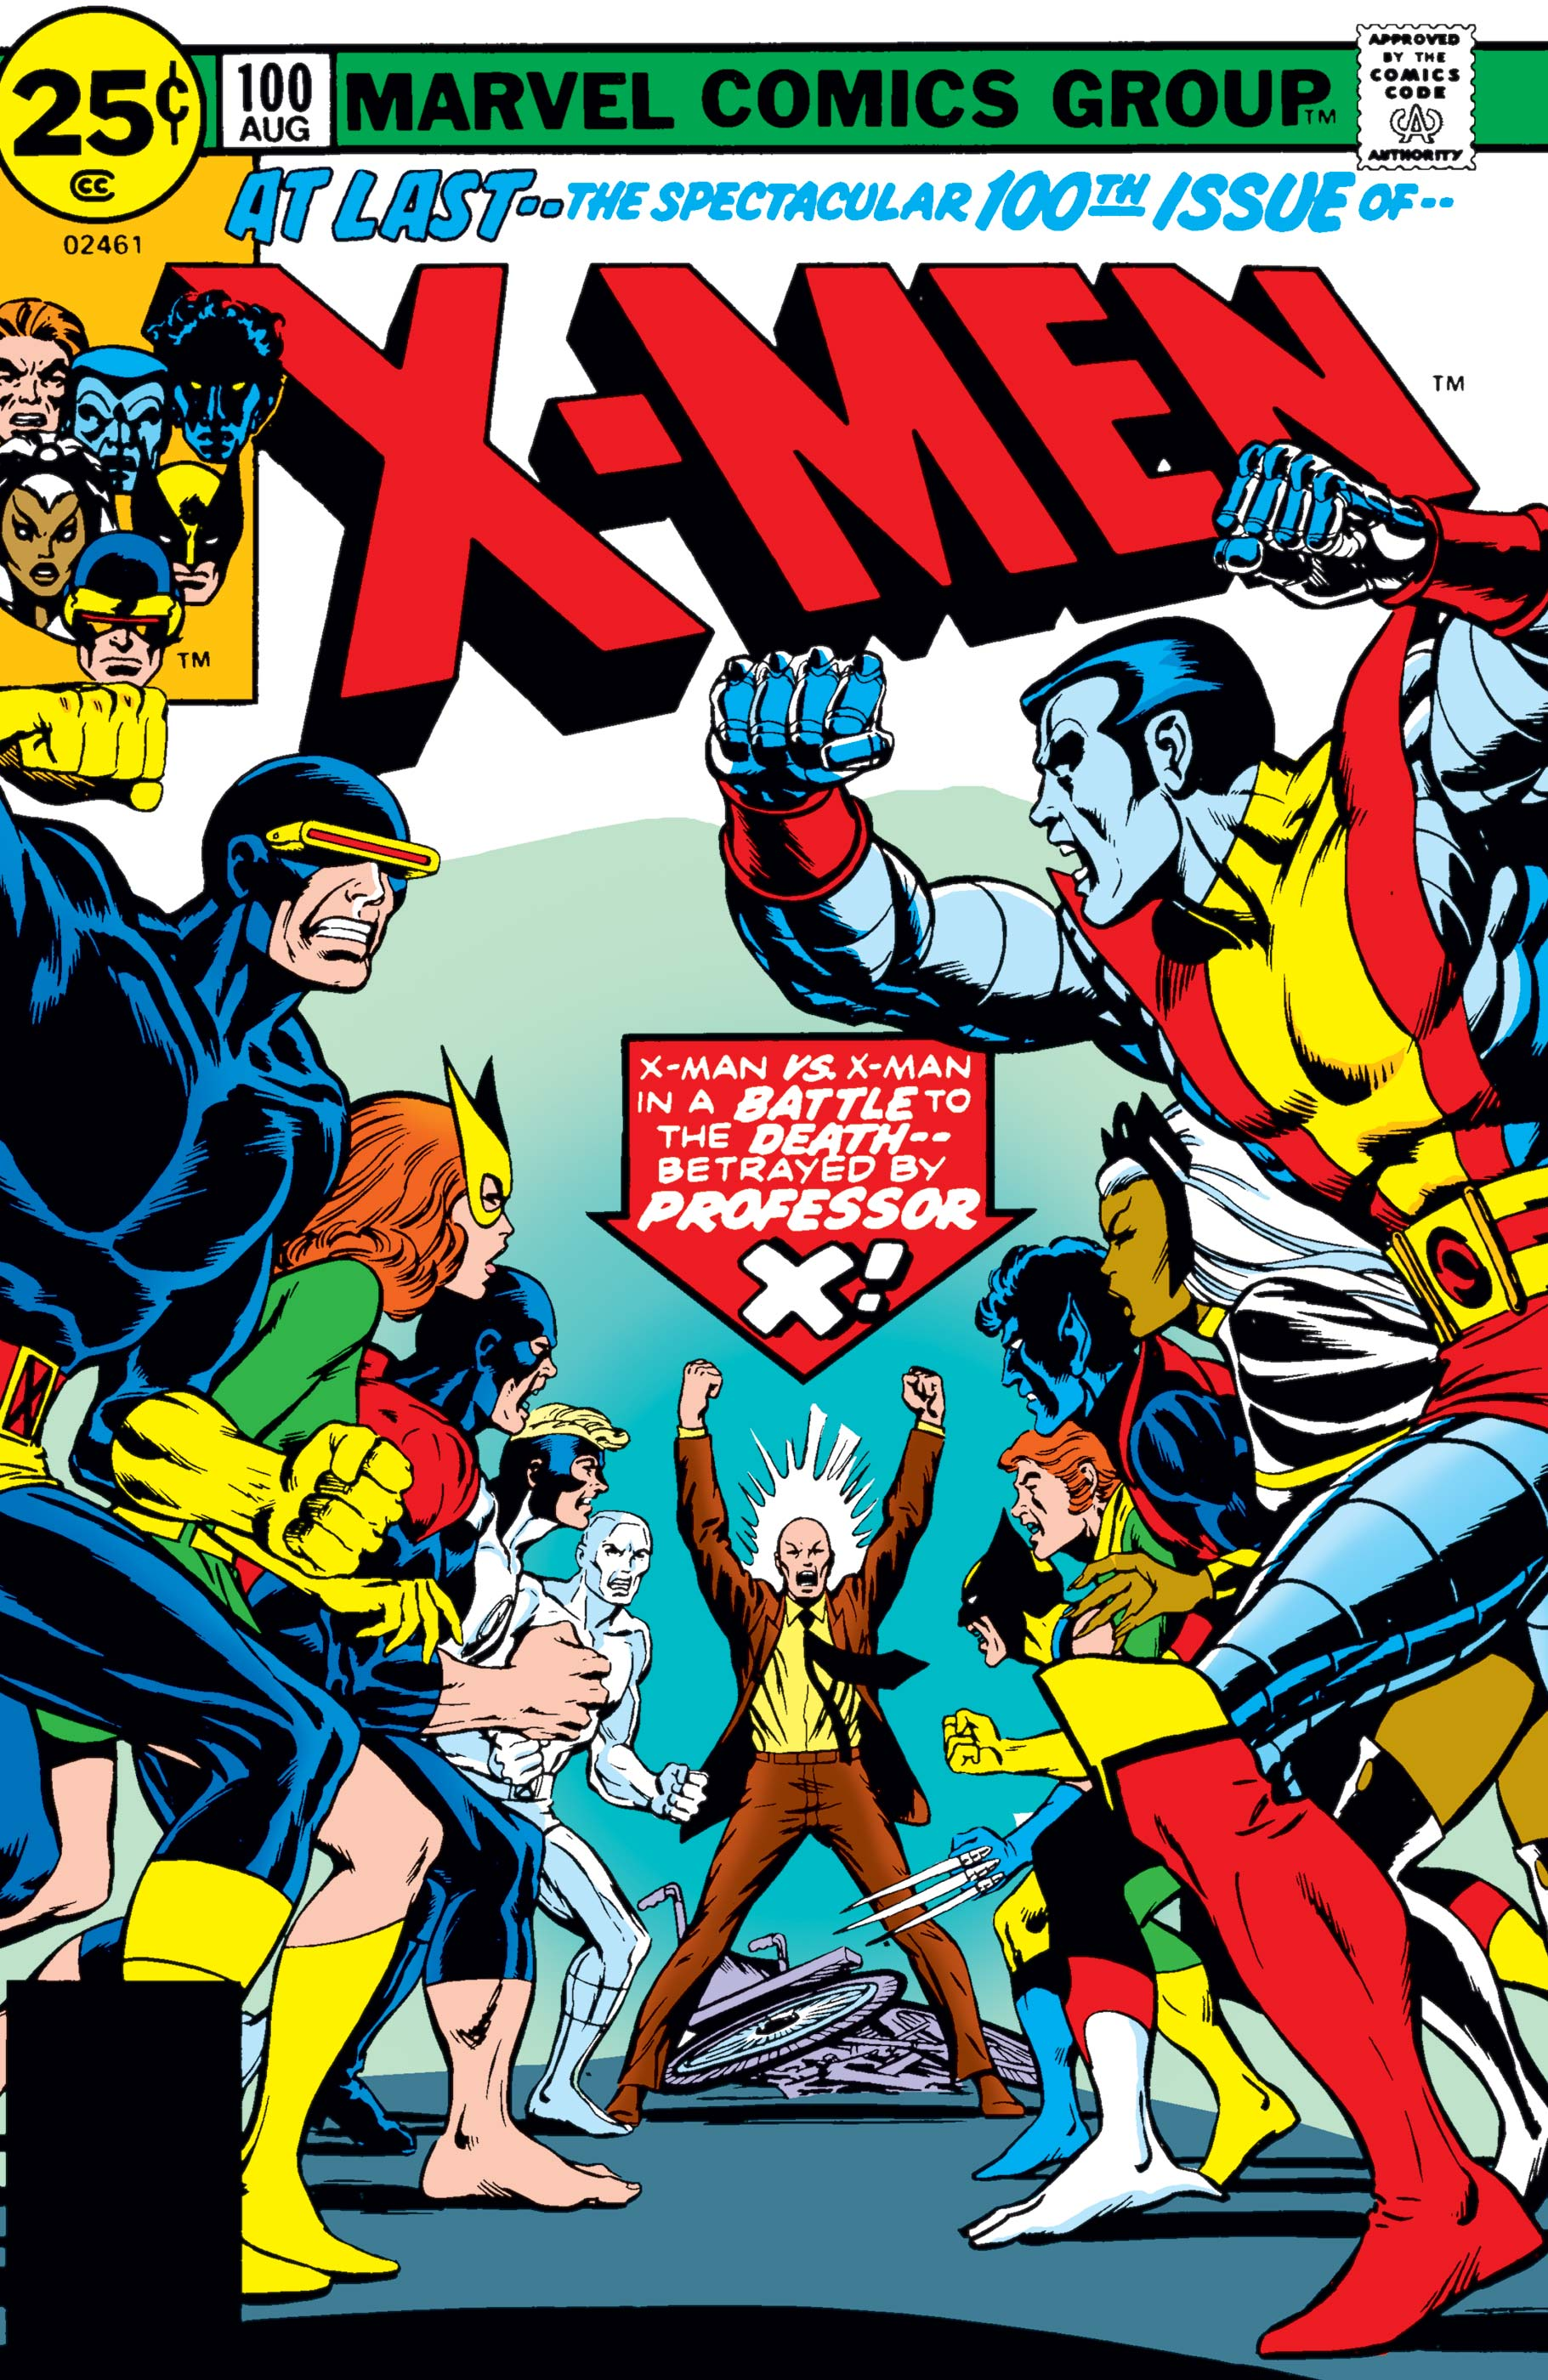 Uncanny X-Men (1963) #100